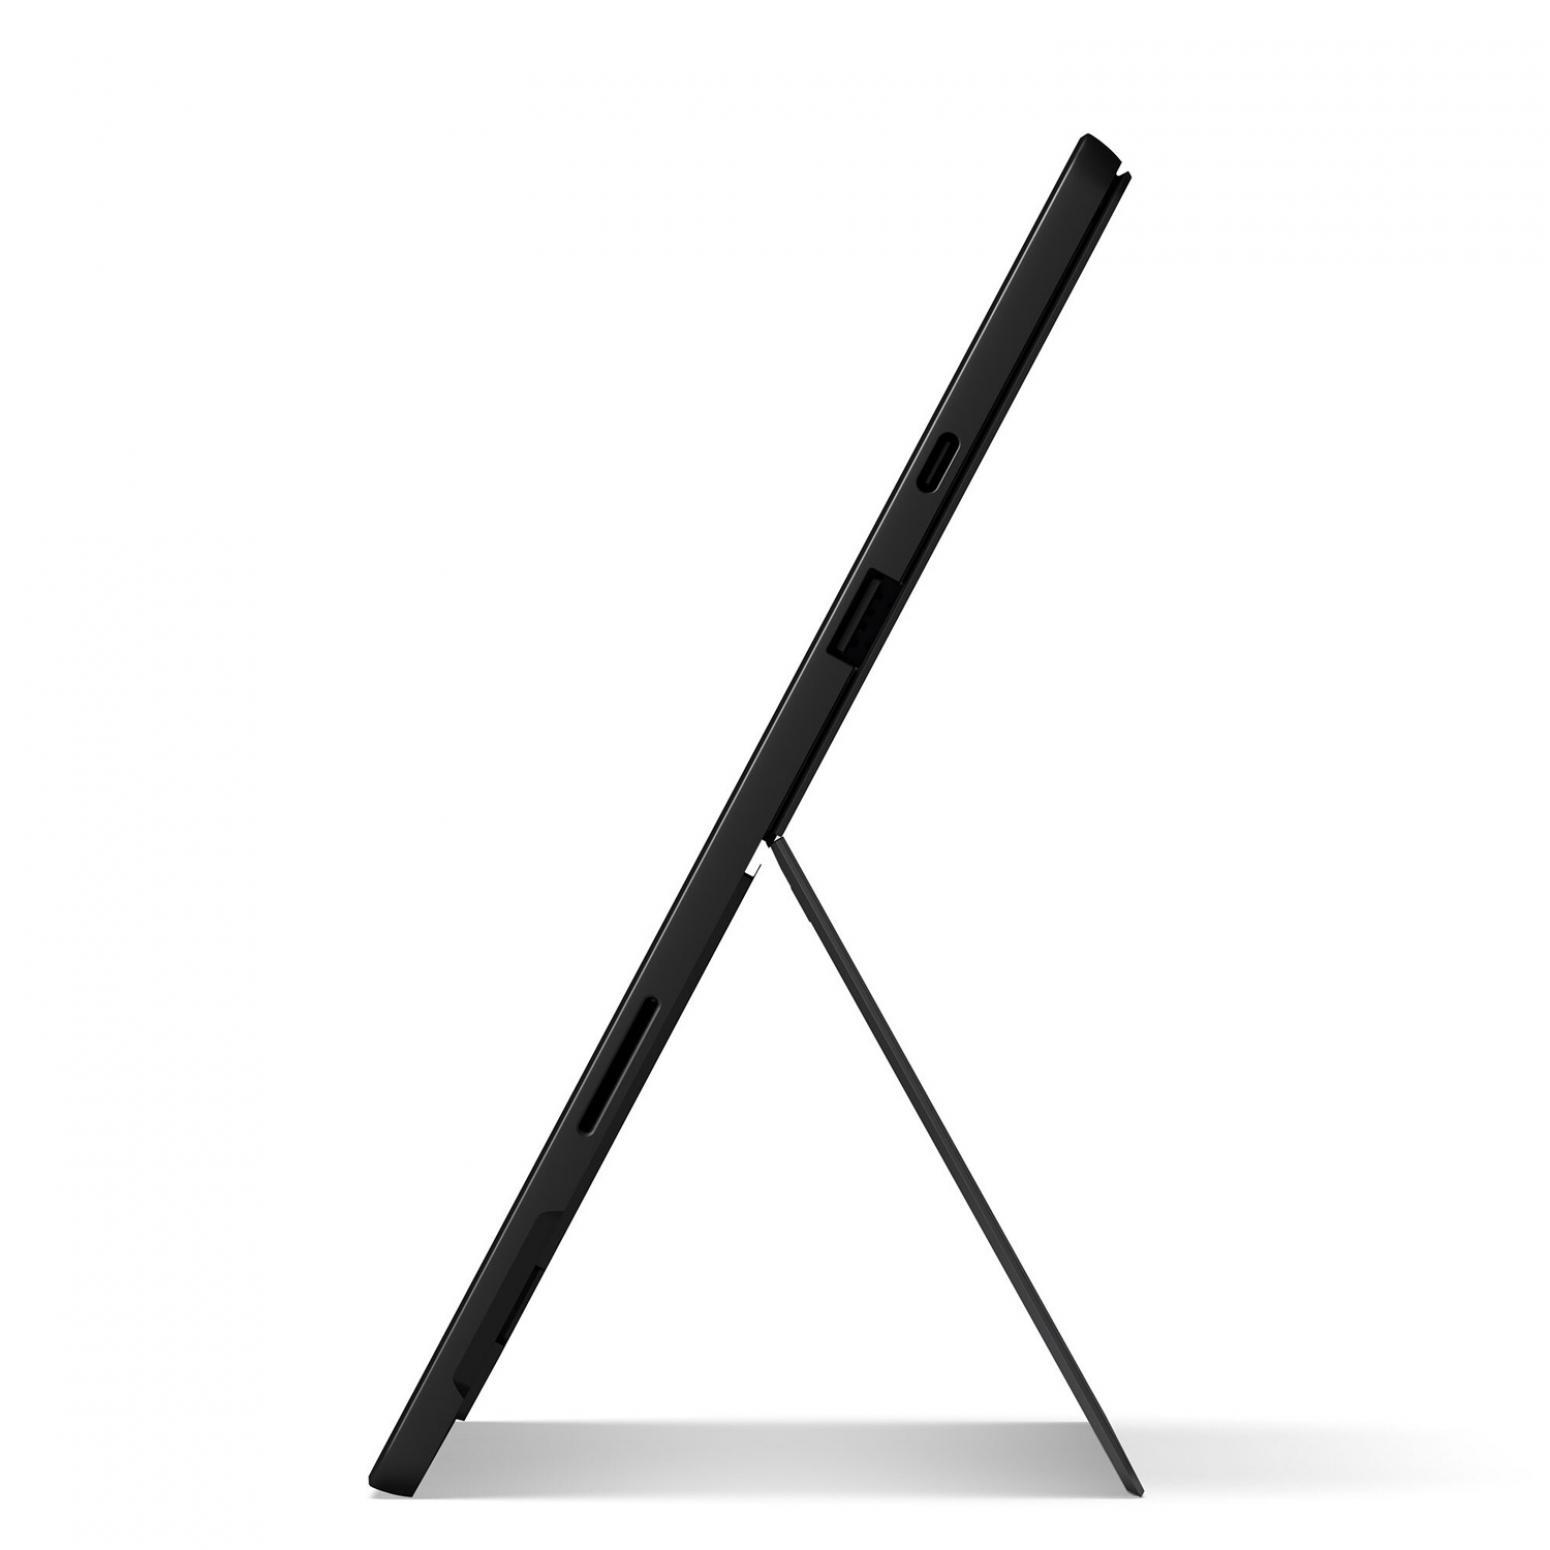 Ordinateur portable Microsoft Surface Pro 7 - Core i5, 8 Go, 256 Go - photo 6